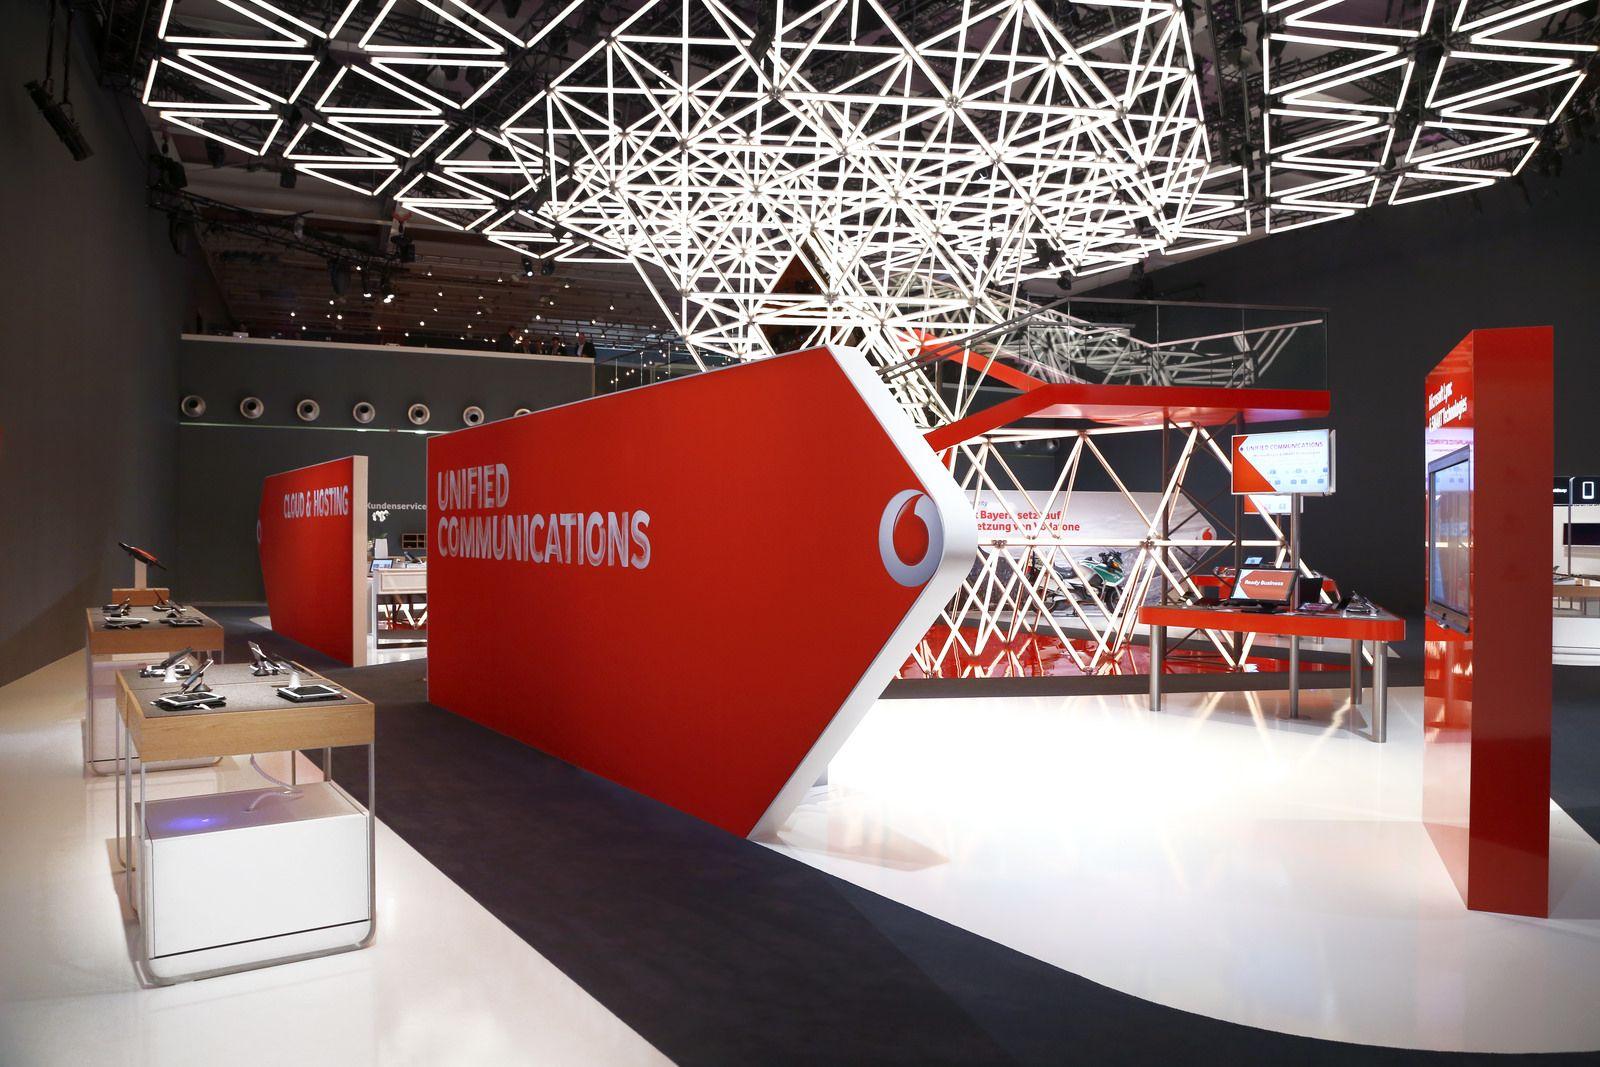 Exhibition stand design  Vodafone trade fair stand @ CeBIT 2014 | Flickr -  Photo Sharing!